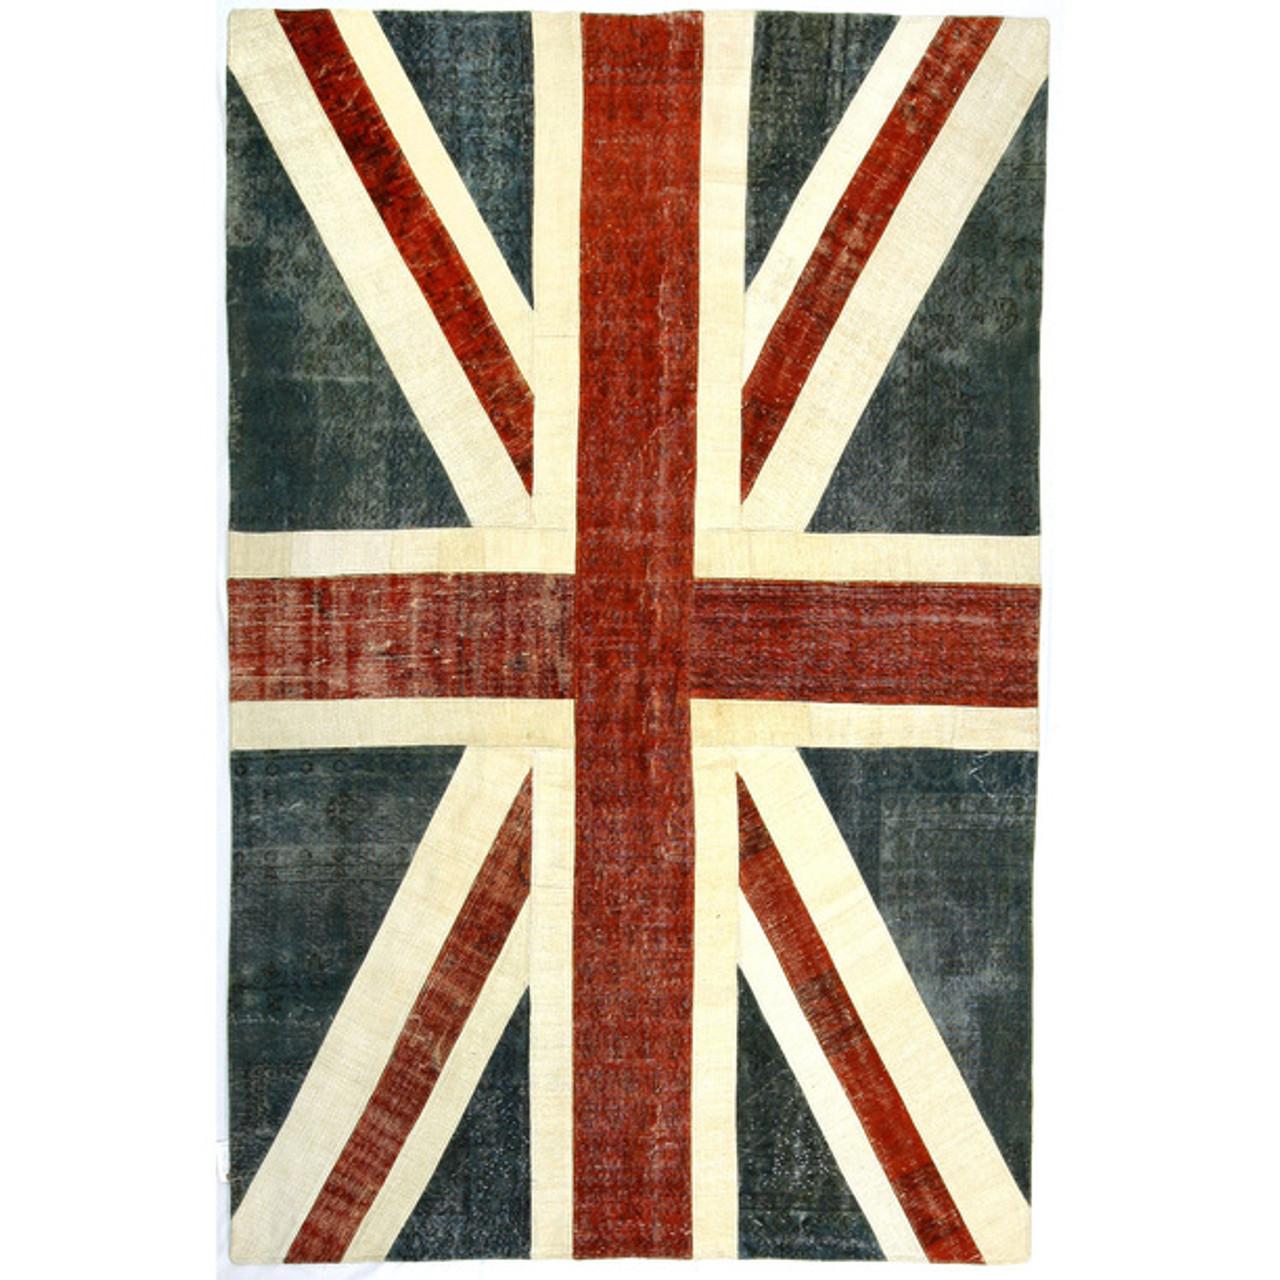 Good Union Jack Turkish Patchwork Rugs